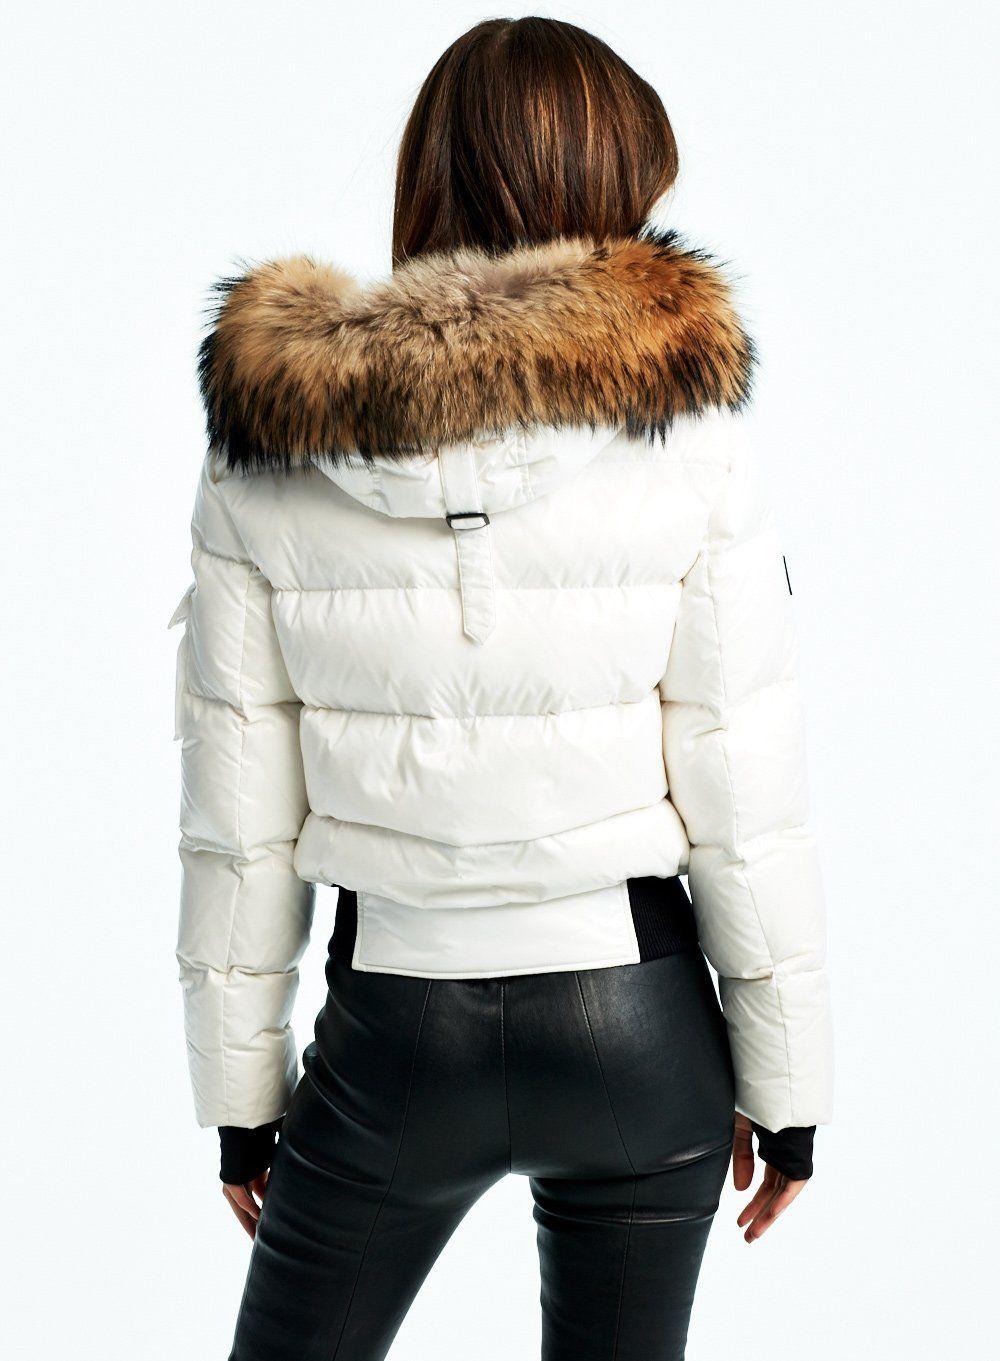 Skyler Skyler Sam New York Sam Nyc Jacket Jackets Fashion Luxury Outerwear [ 1361 x 1000 Pixel ]